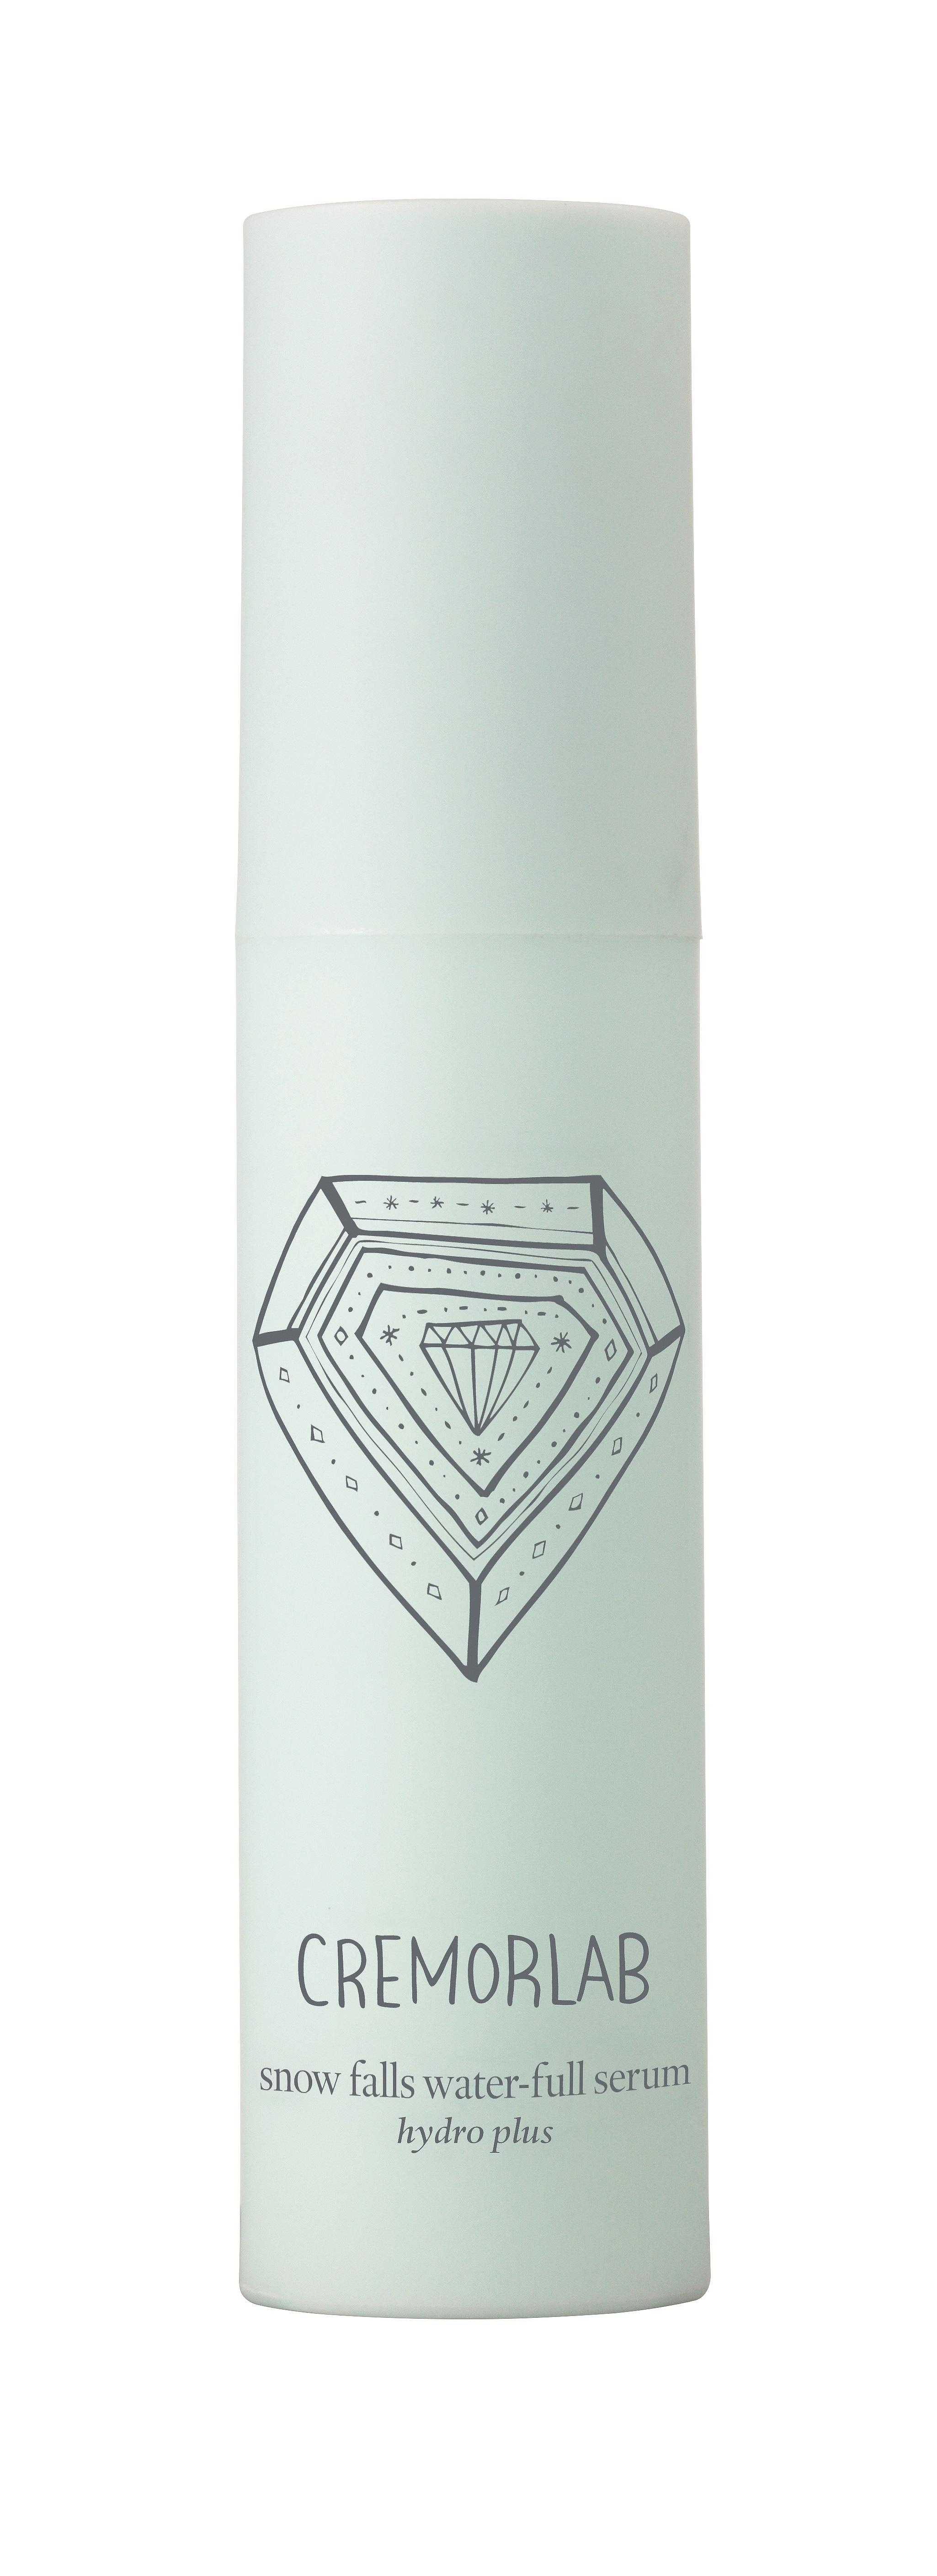 Hydro Plus Snow Falls Water-full Serum 30ml